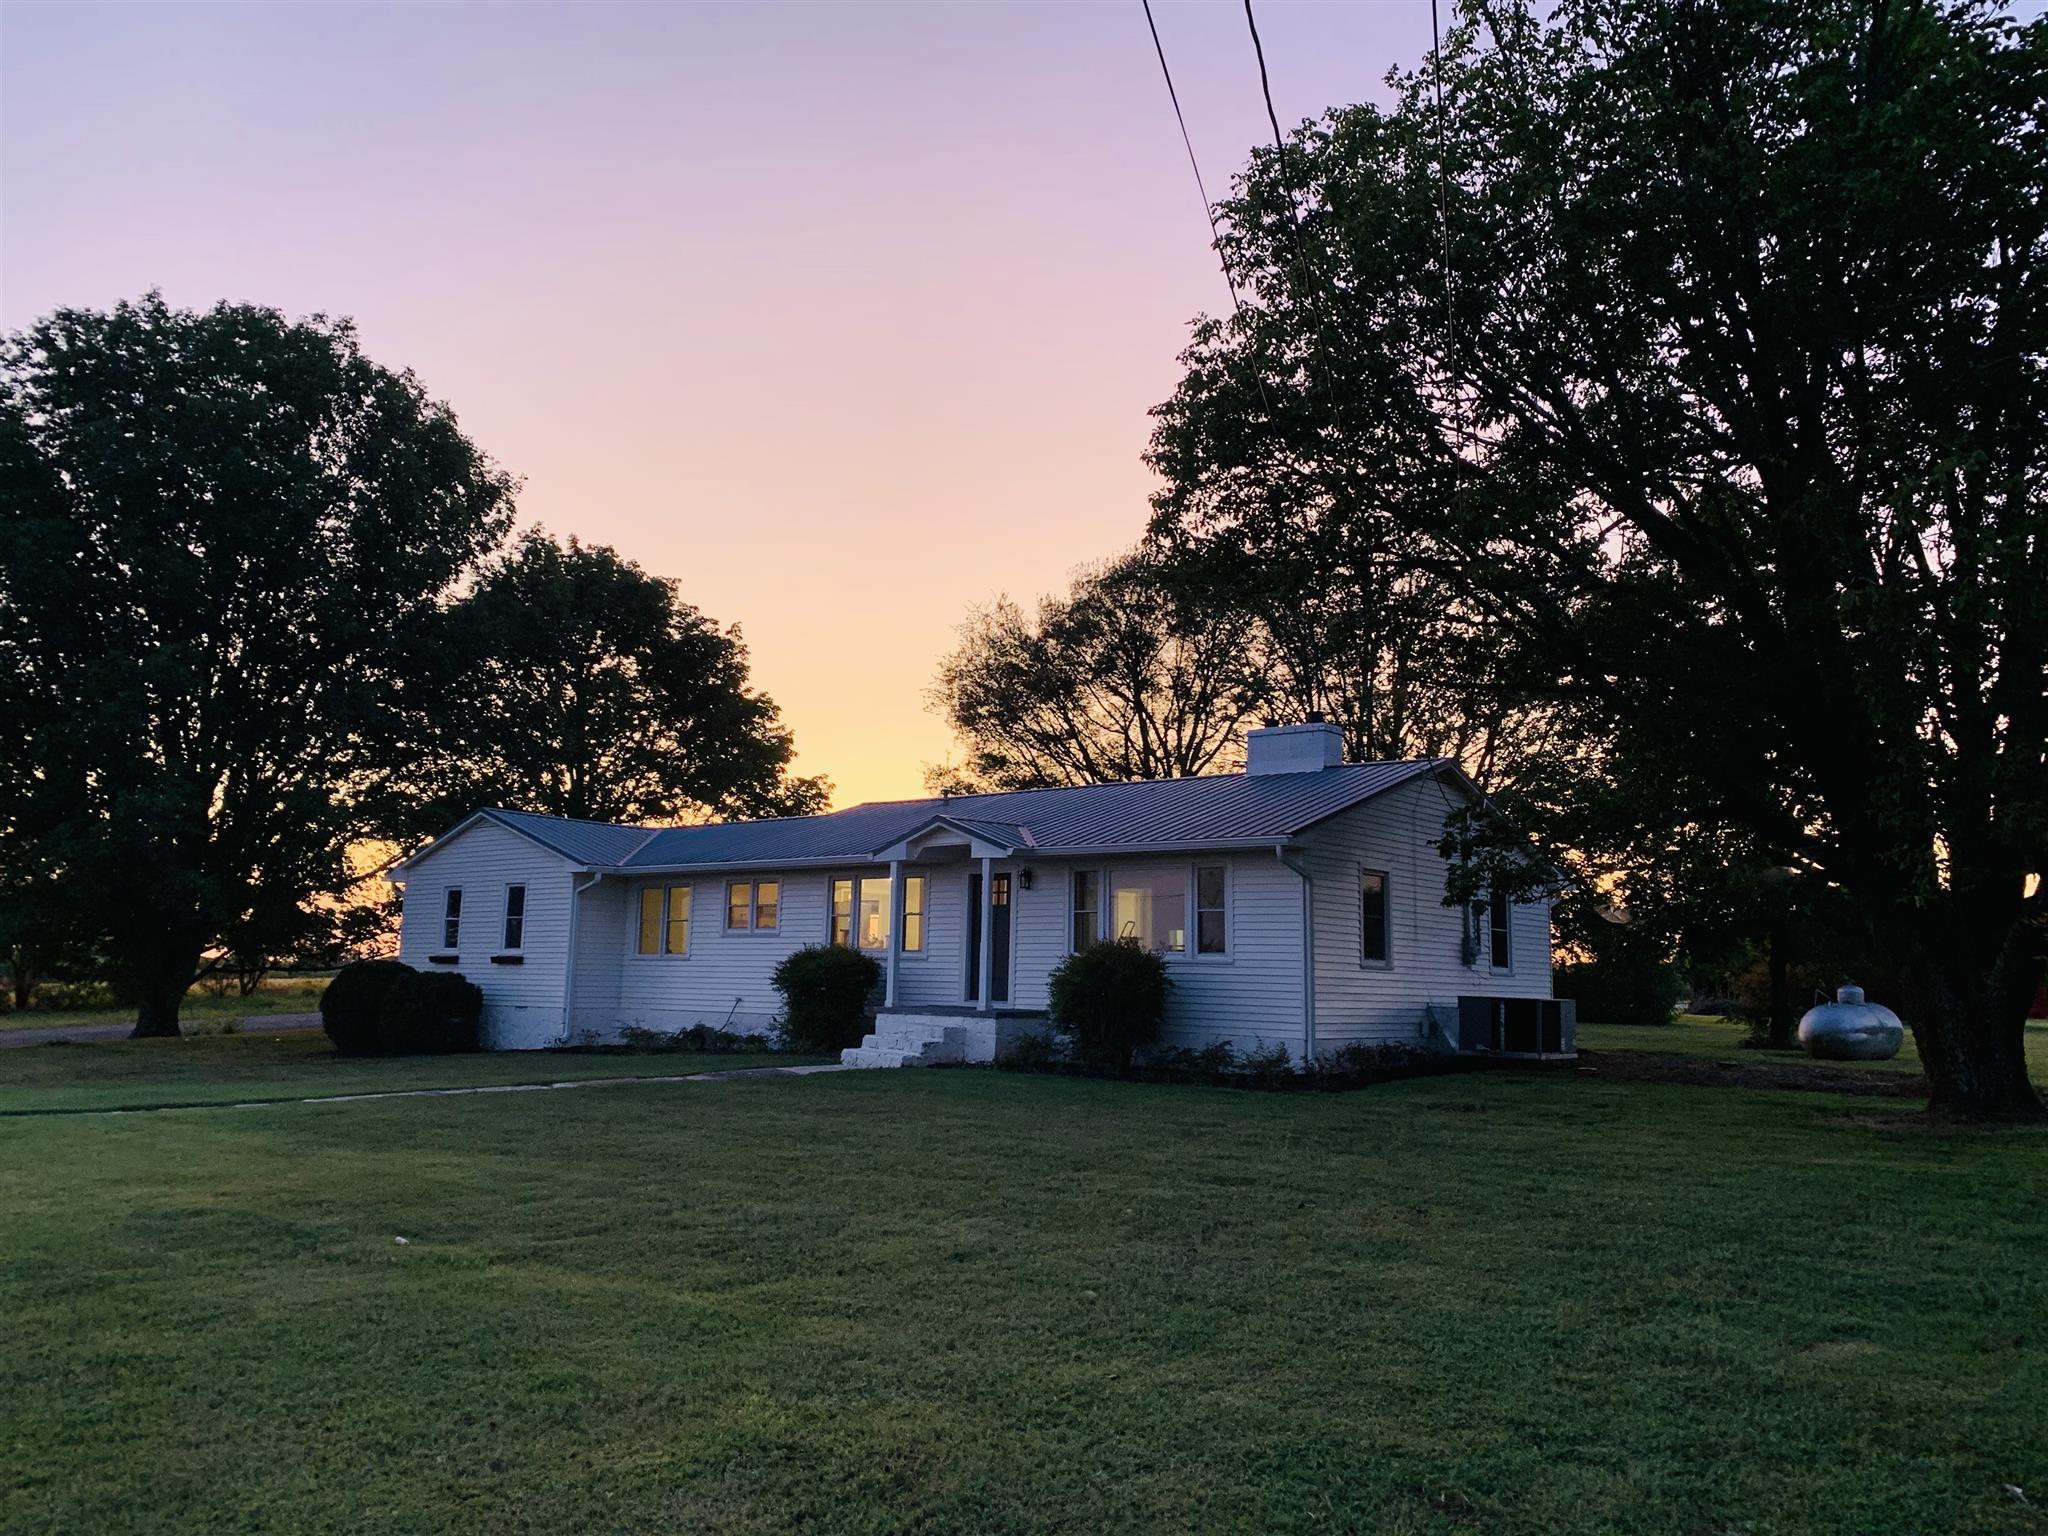 3845 Old Alto Highway, Decherd, TN 37324 - Decherd, TN real estate listing